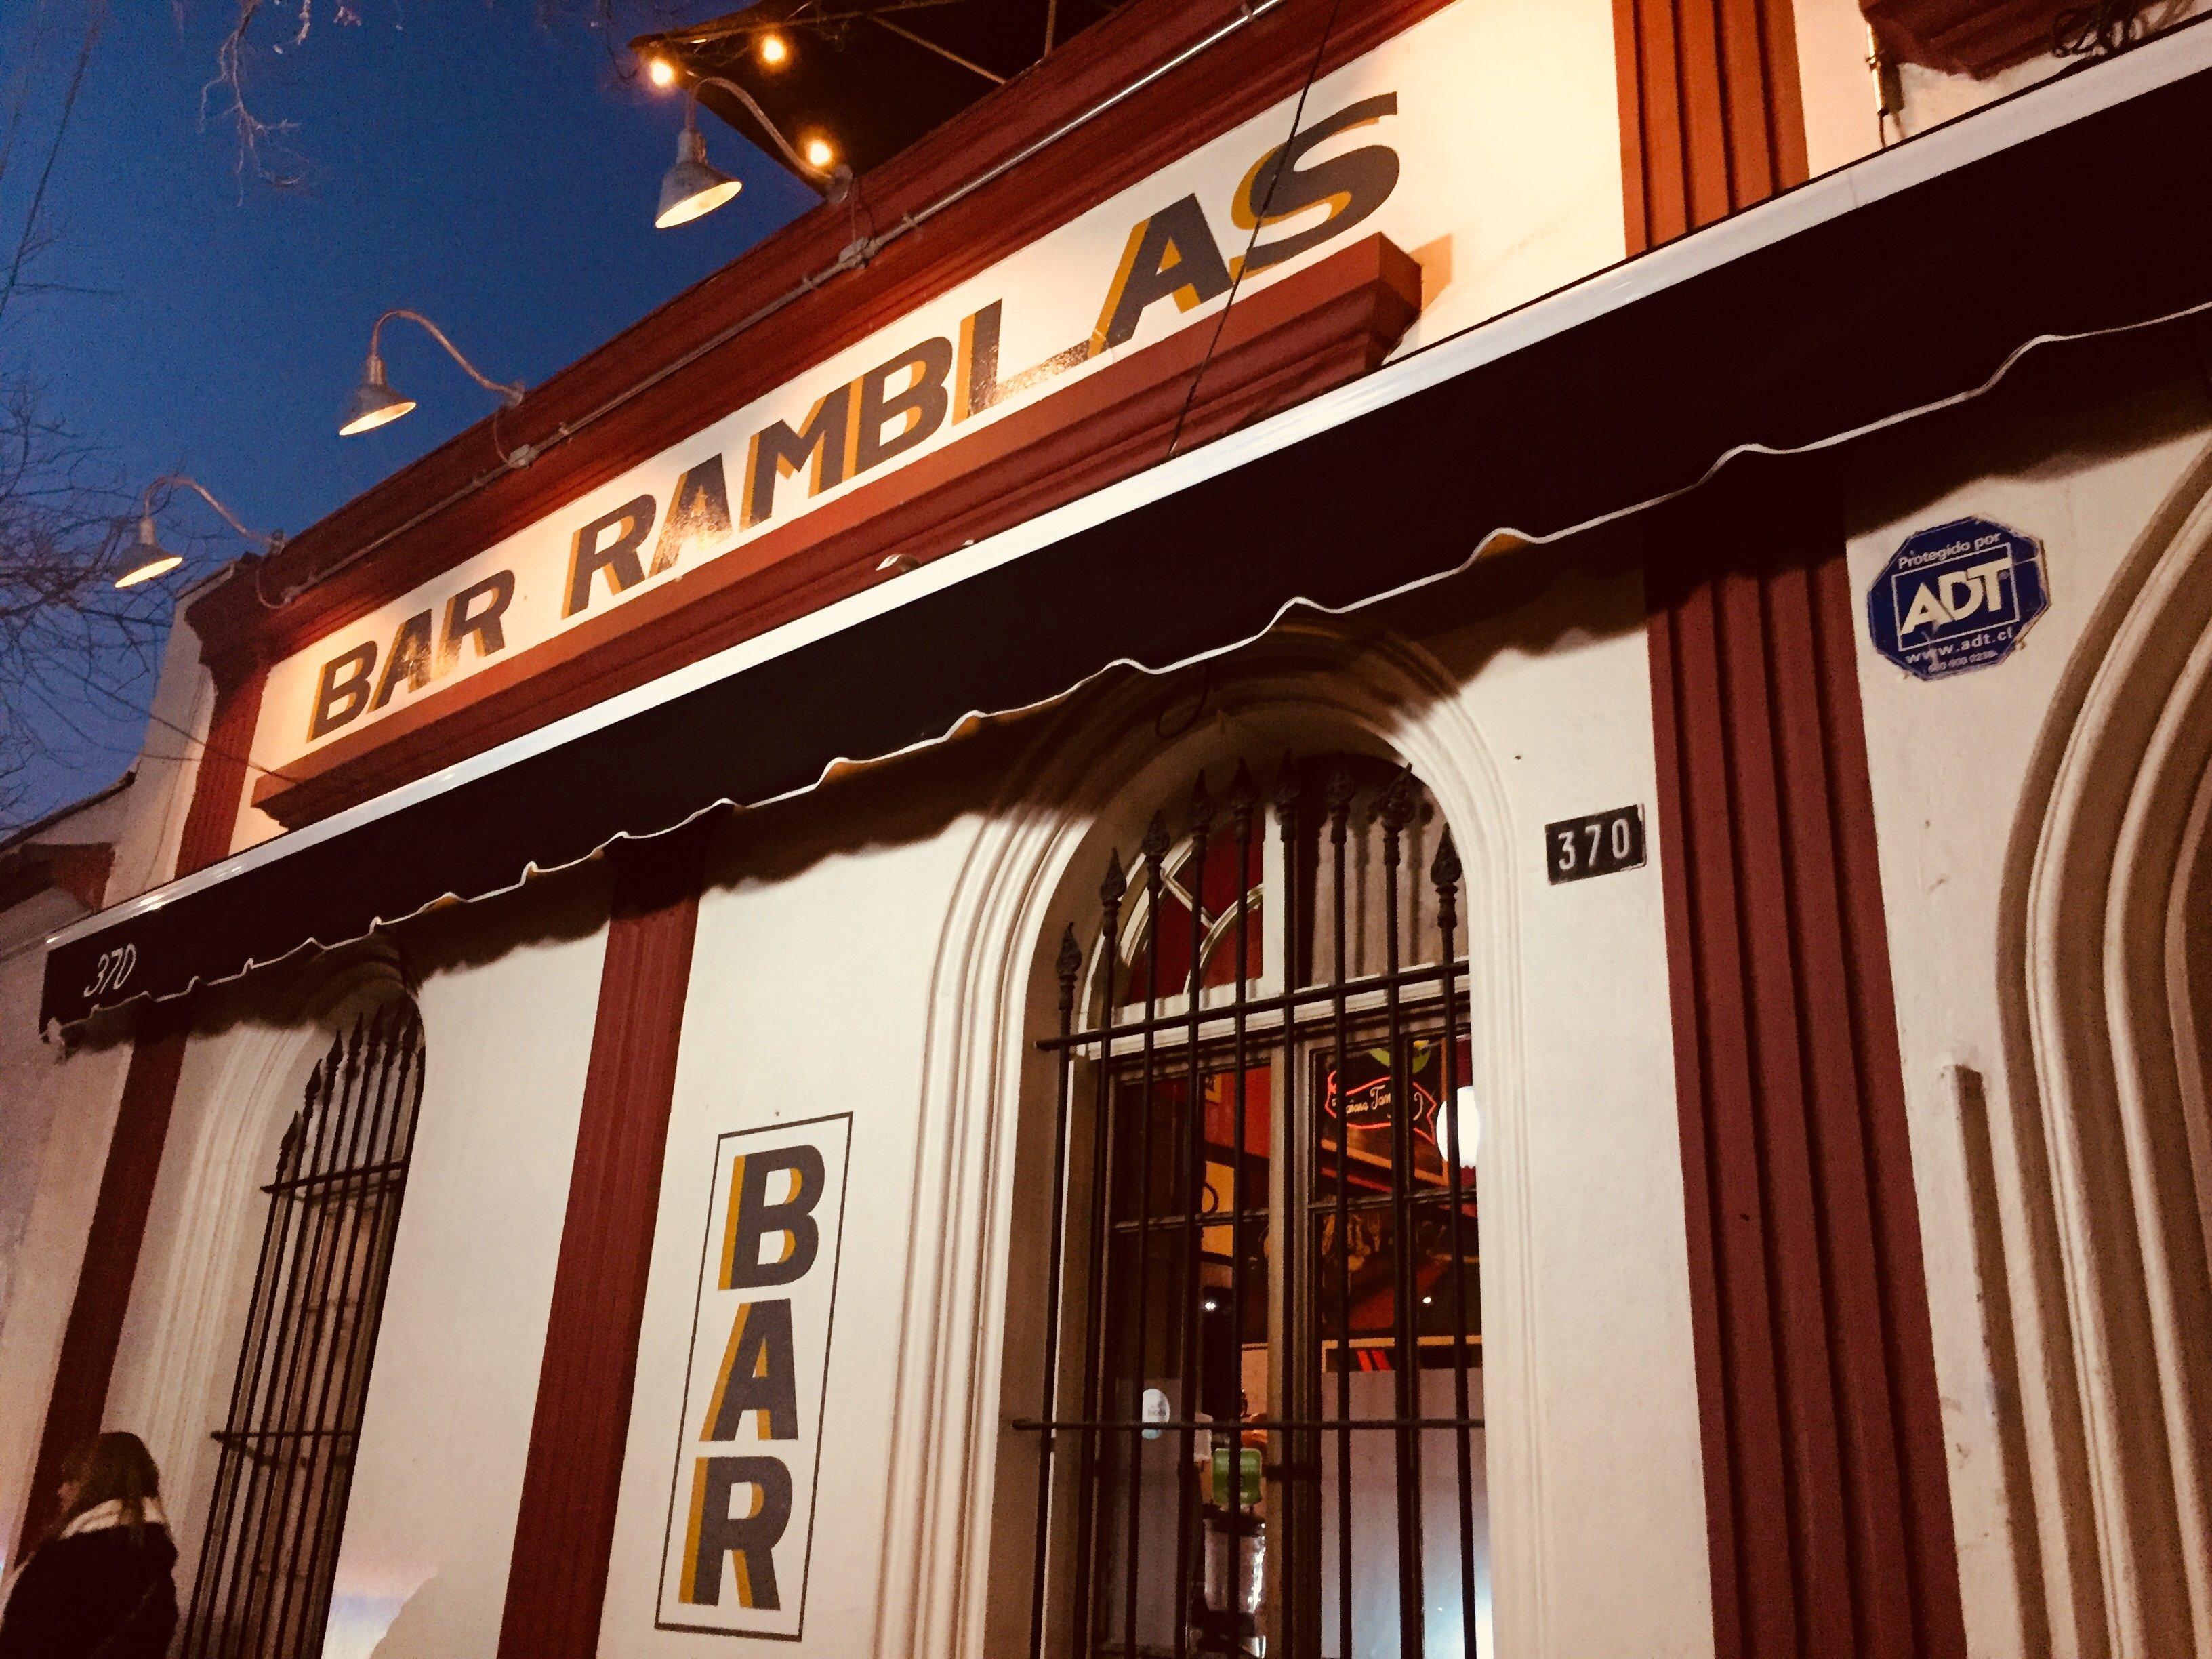 Ramblas Bar Restaurante